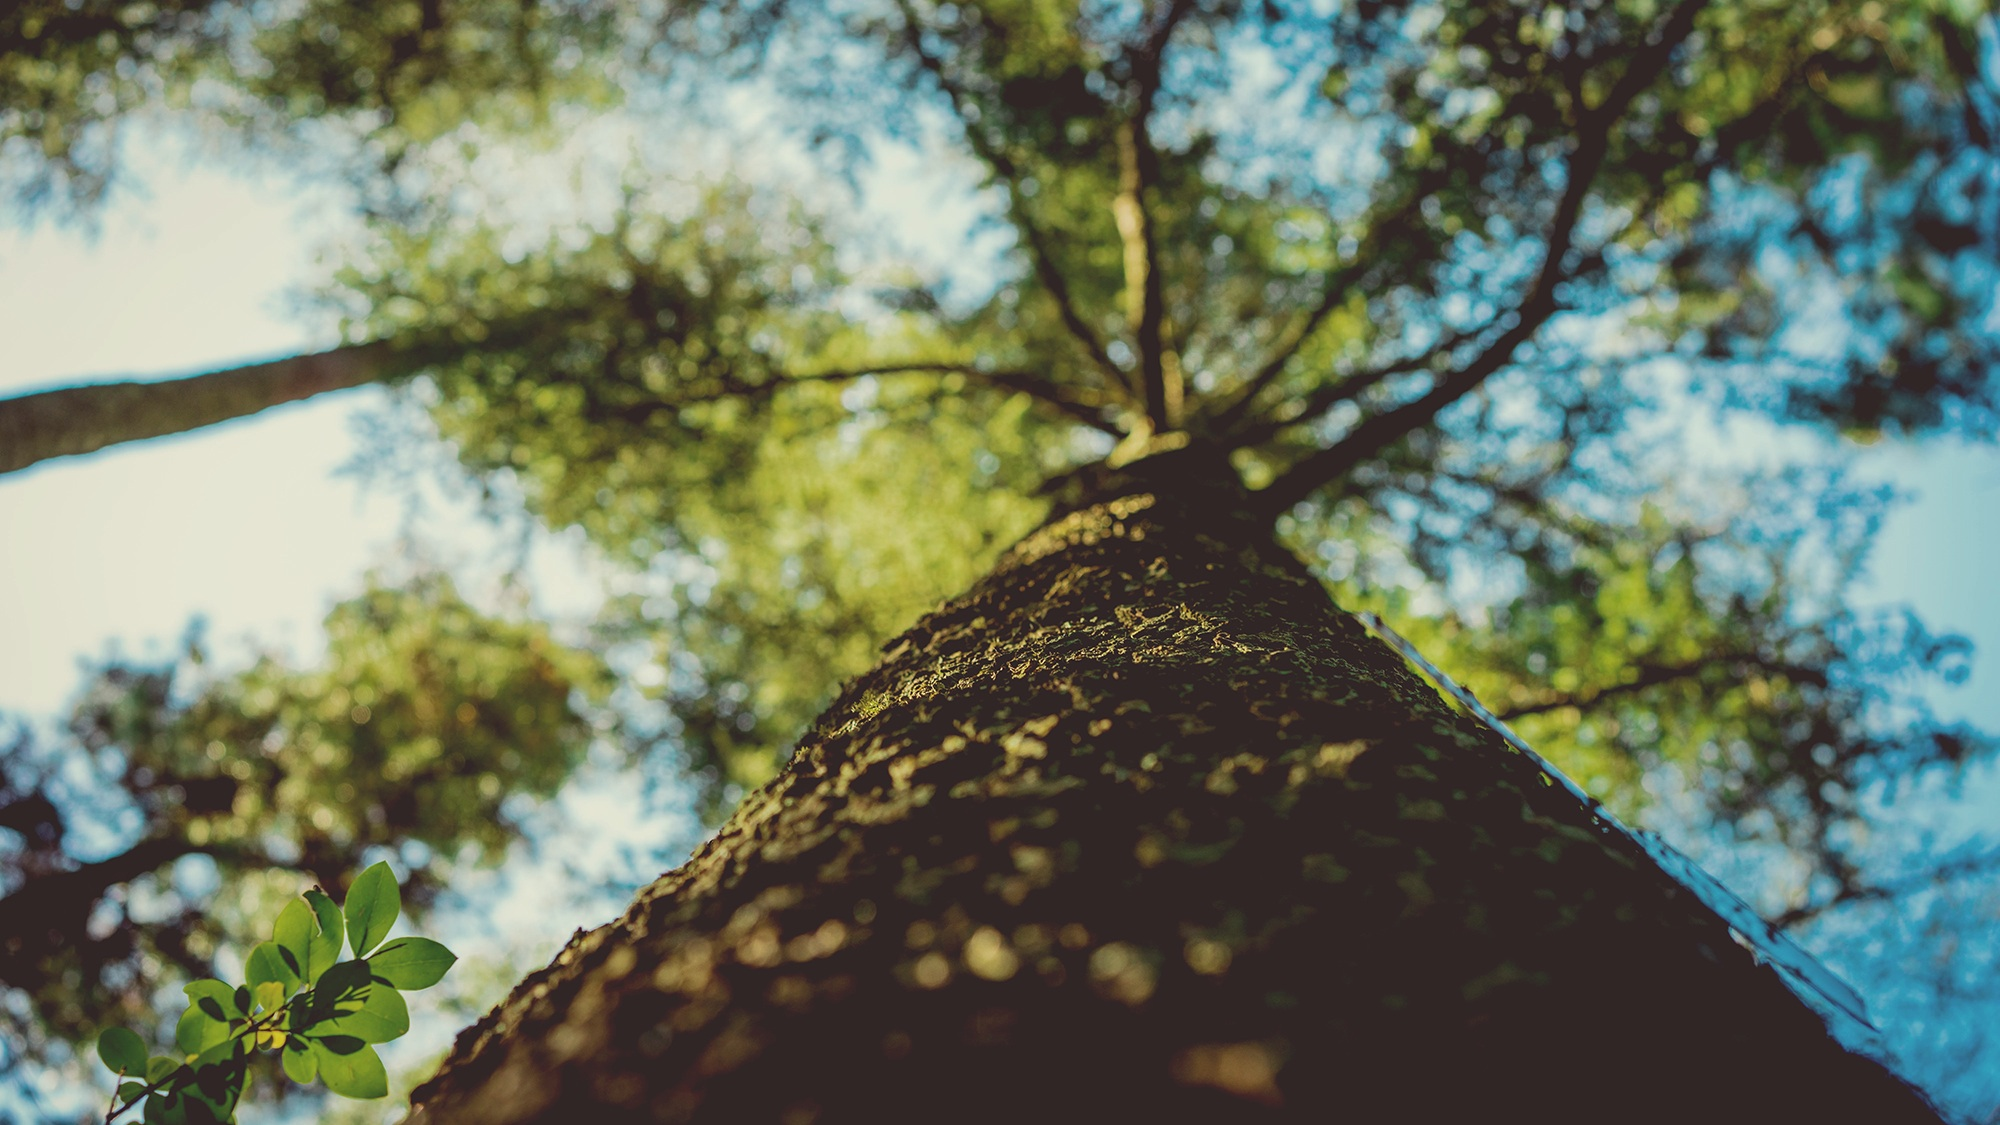 árbol, ramas, tronco, hojas, cielo, evolución - Fondos de Pantalla HD - professor-falken.com